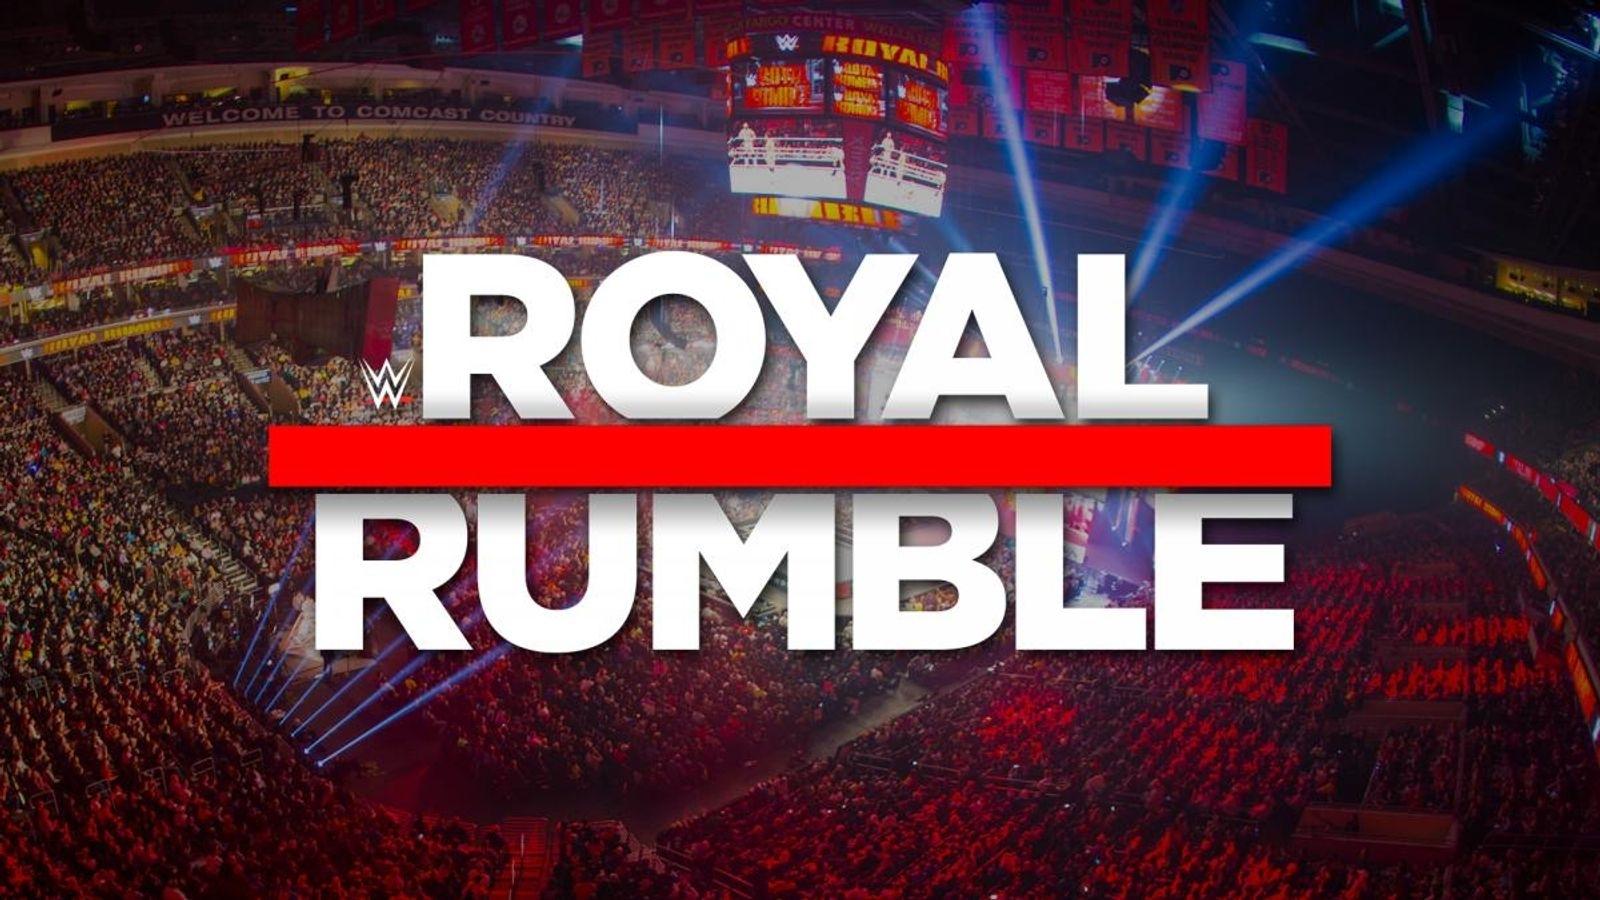 Wwe Royal Rumble Headed To Philadelphia In January 2018